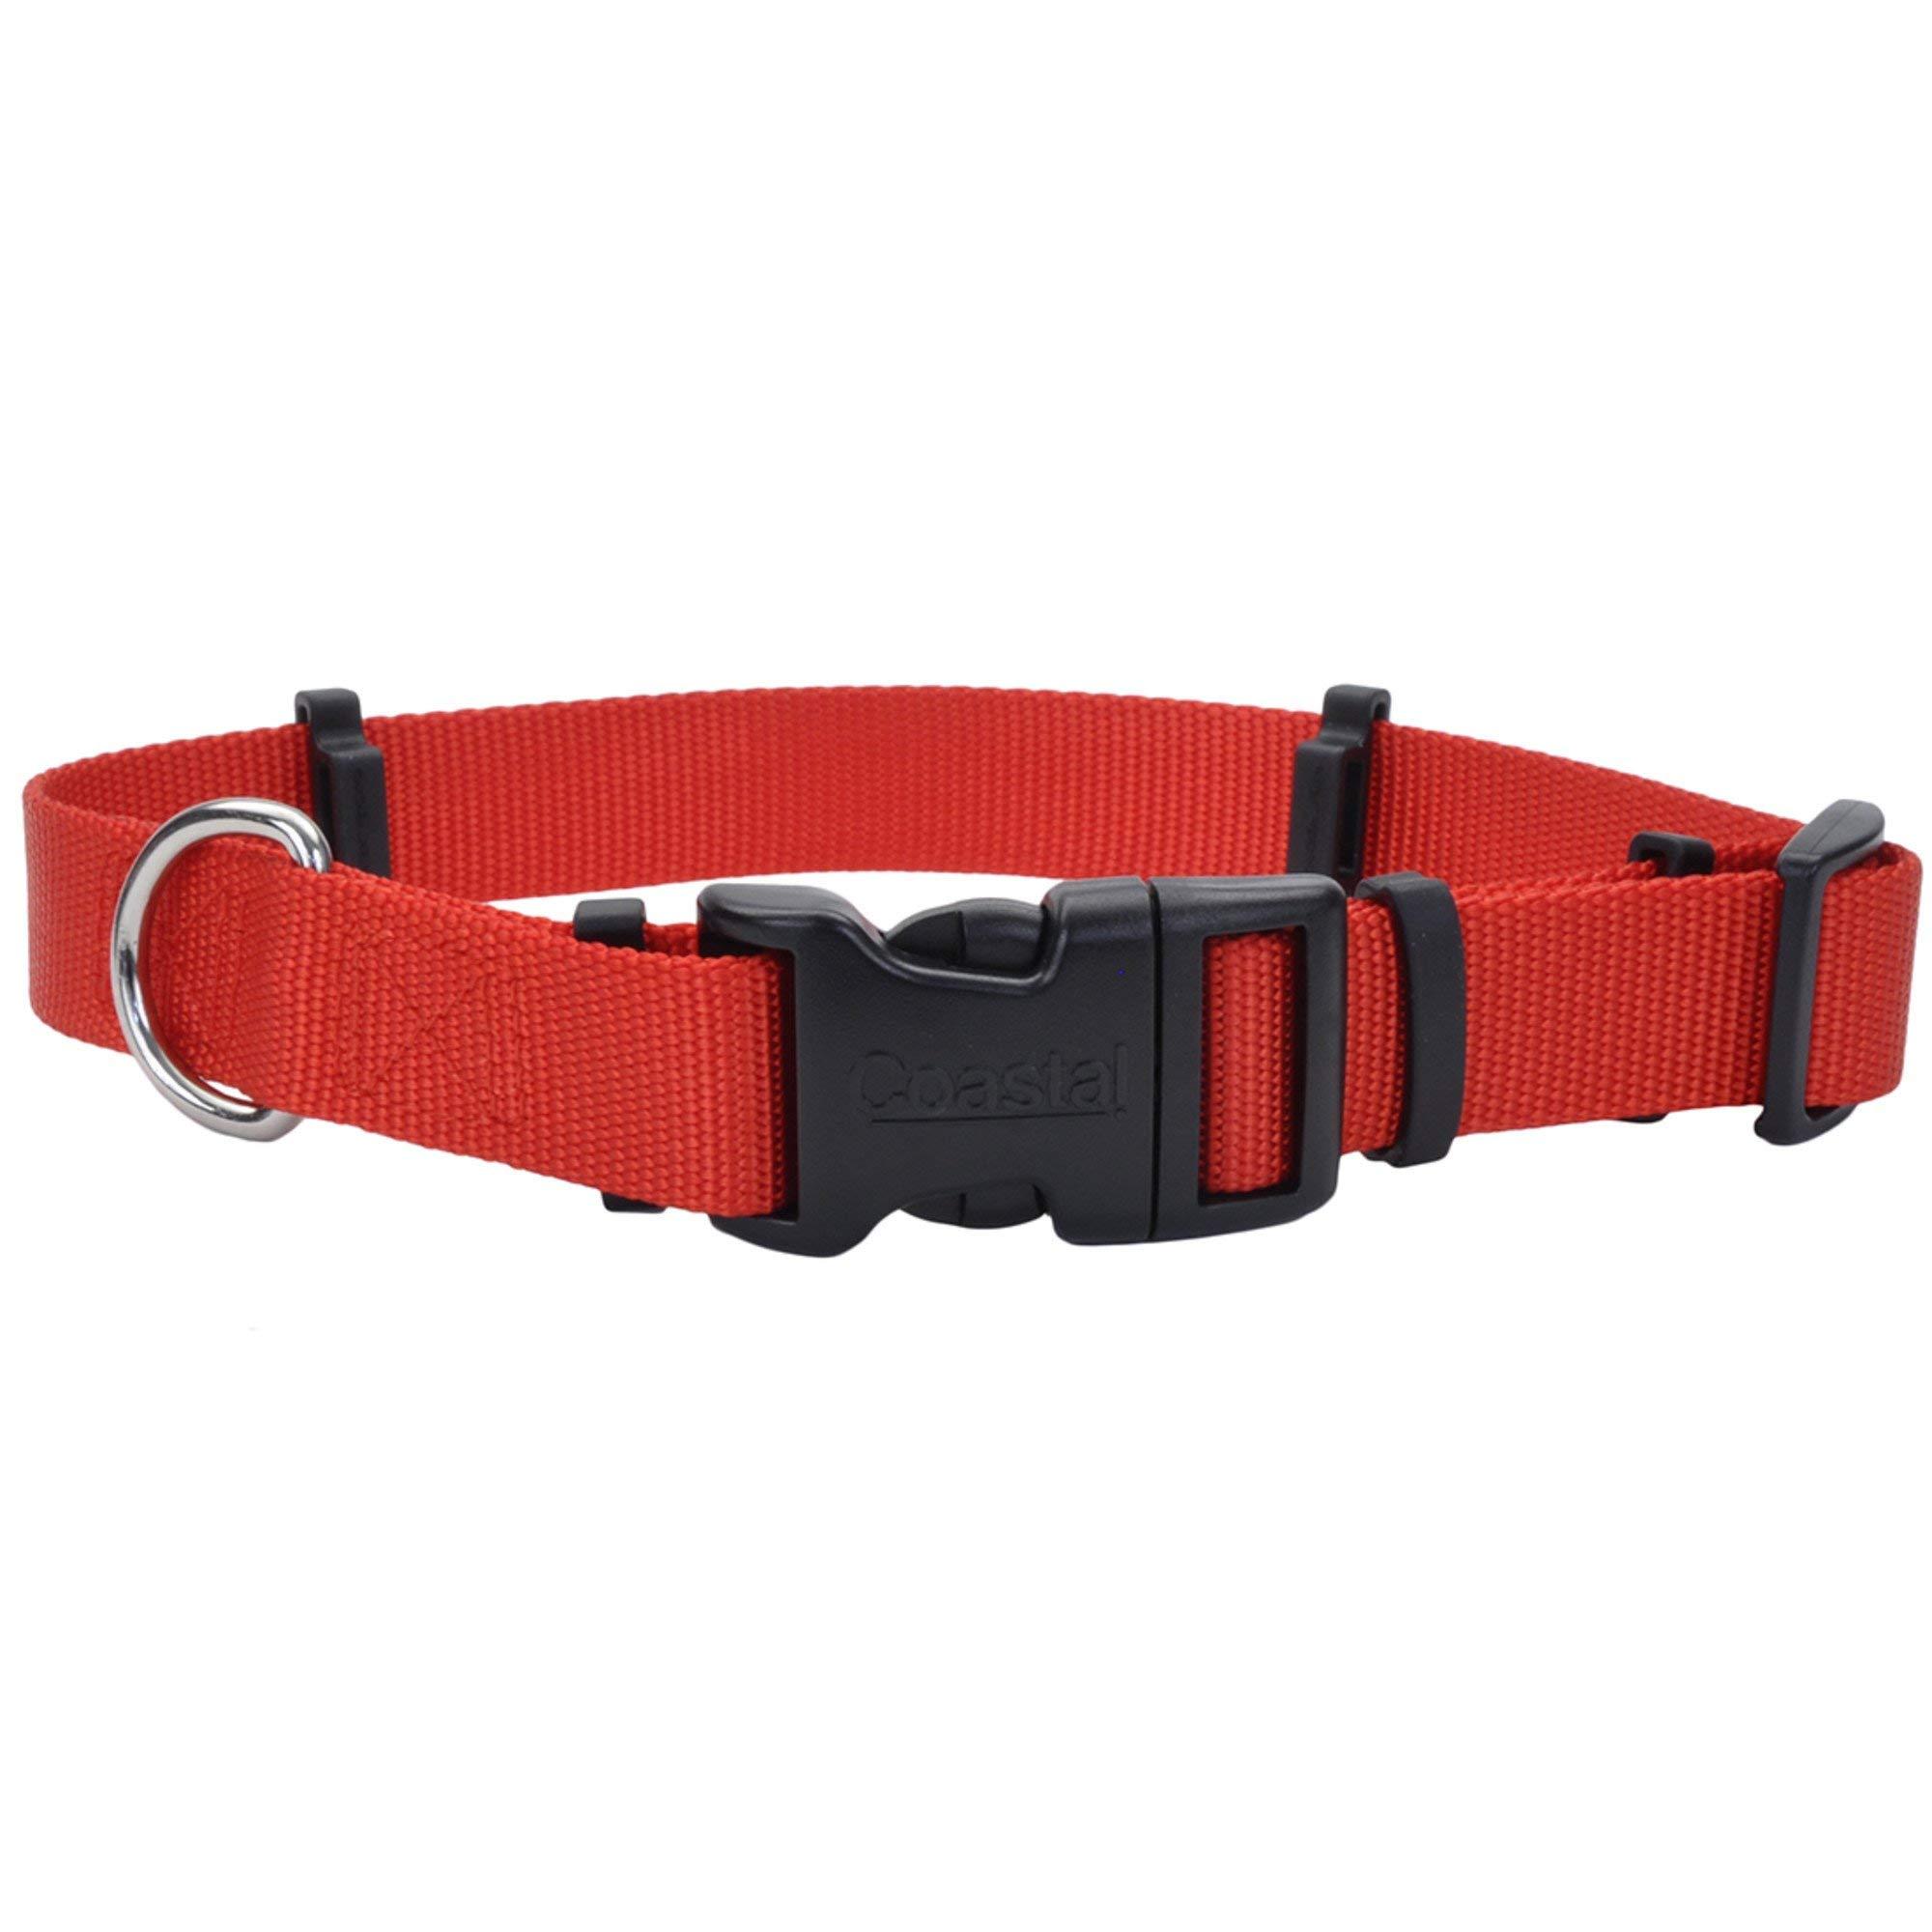 Coastal Pet Products 06192 RED20 Flea Collar Protector, 1'' x 20'' Medium, Red by Coastal Pet